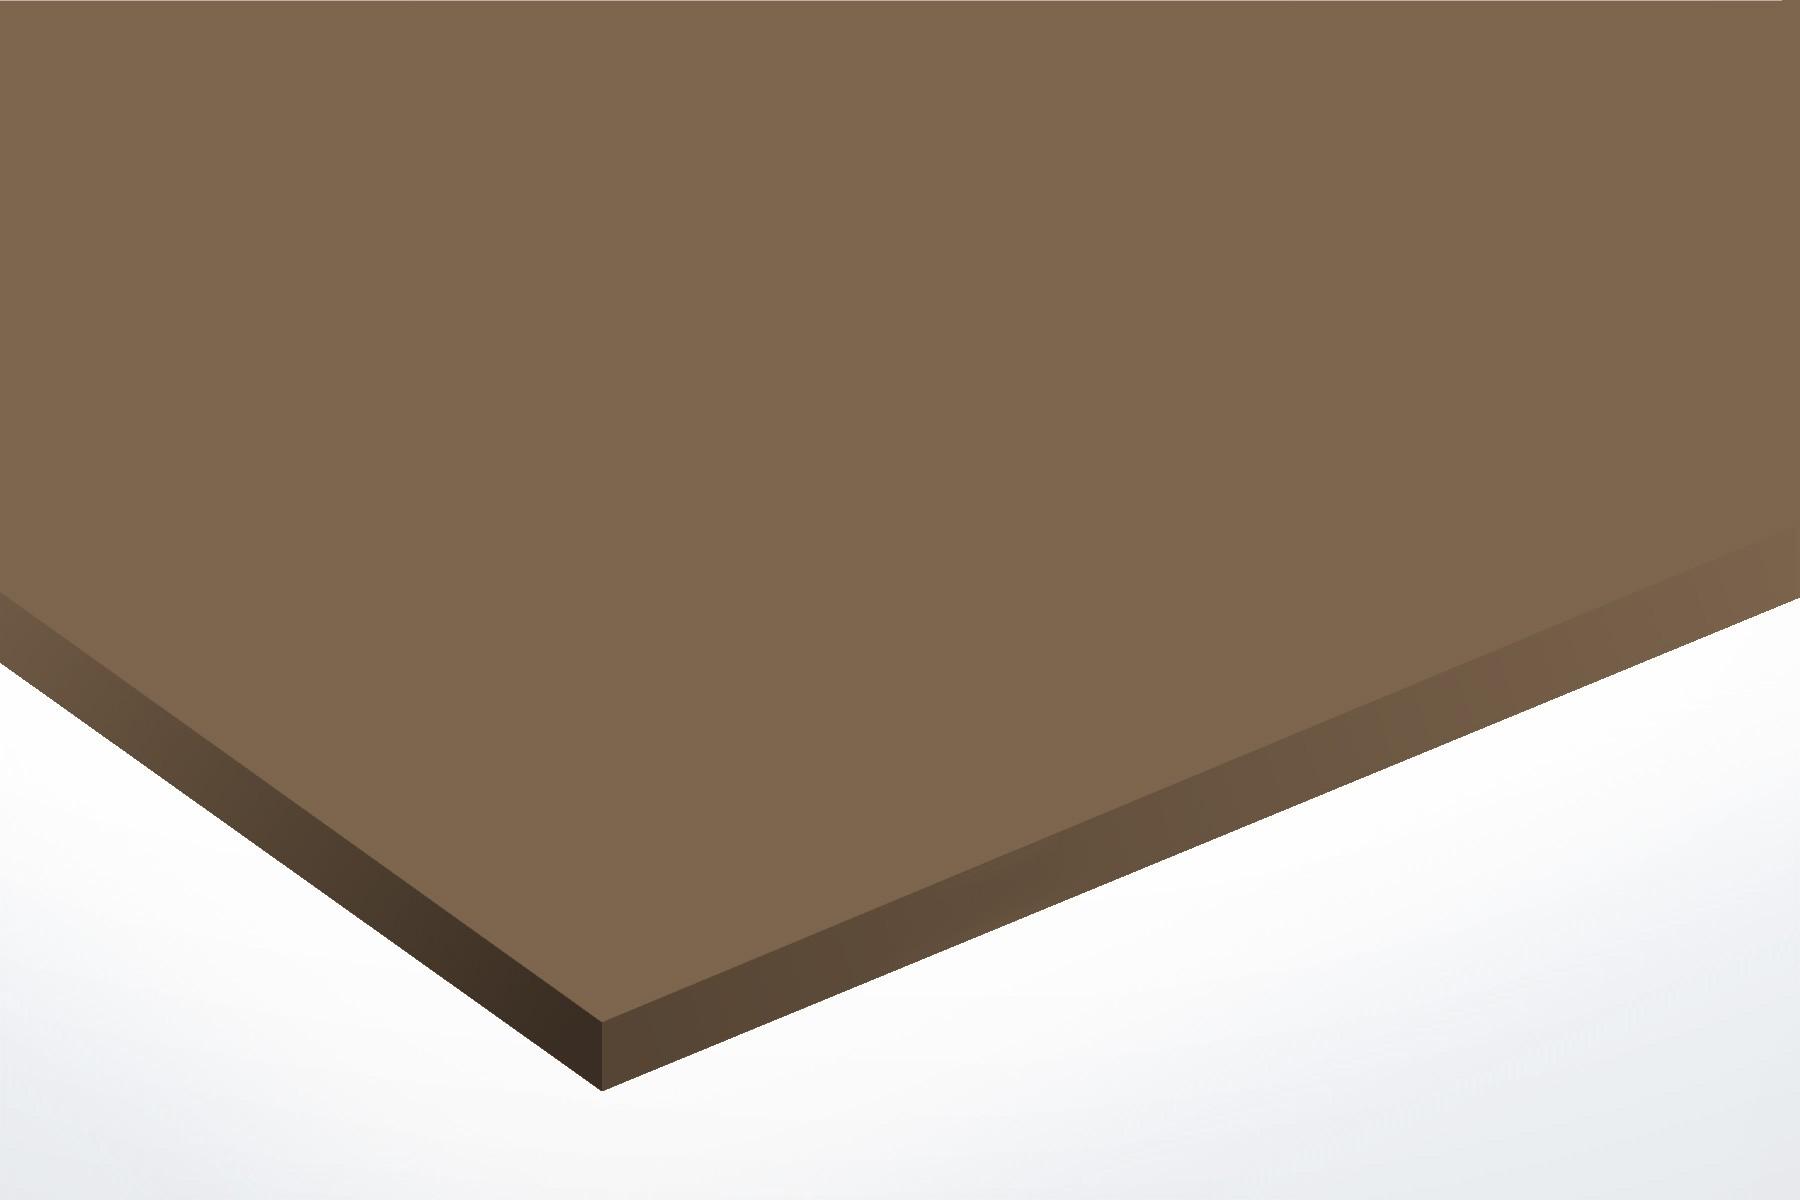 301/10/9397 Alu mat Bronze clair 1mm